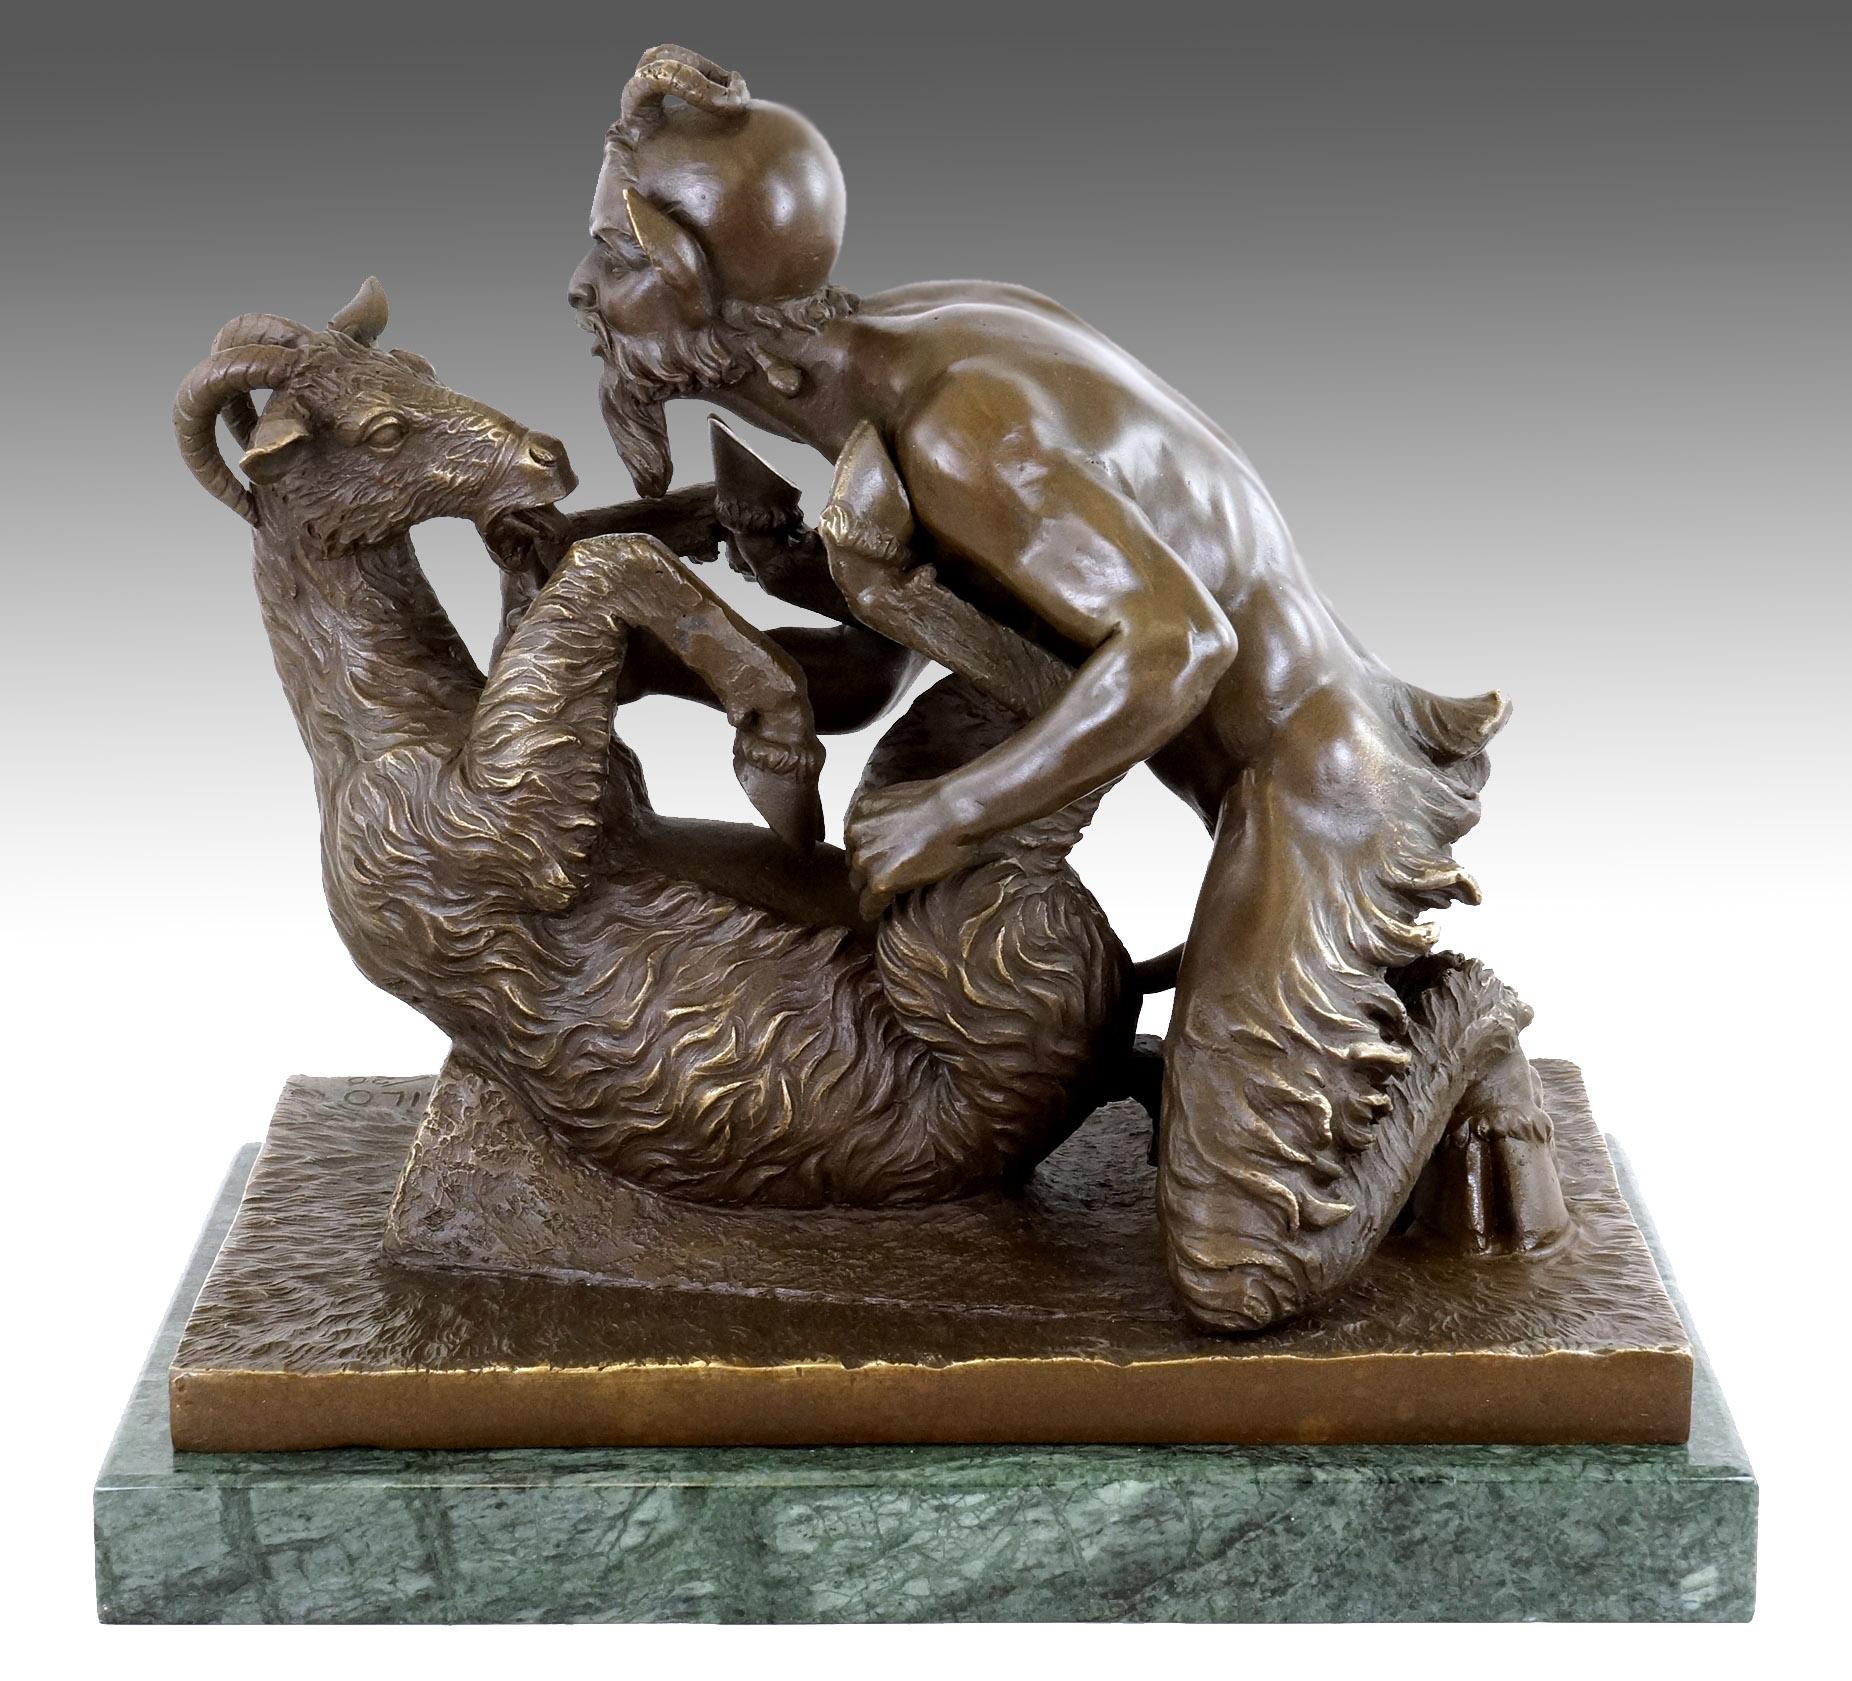 Dreamer- Bronze Female Nude Statue, JN-Bronze, JNEP509